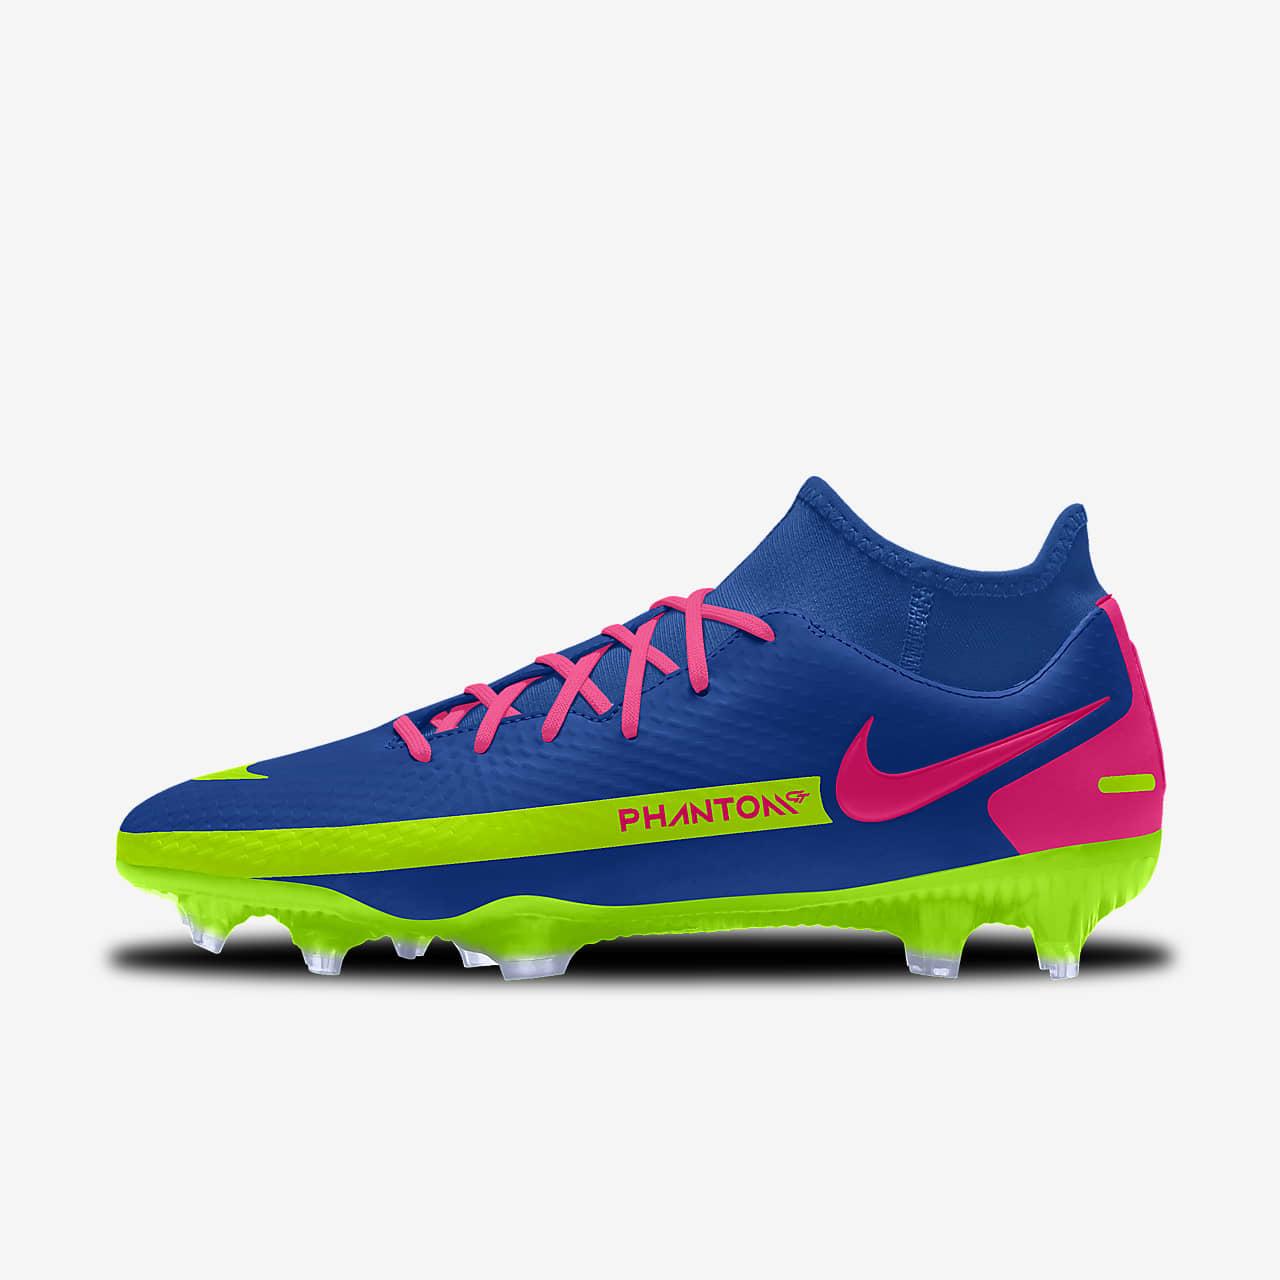 Nike Phantom GT Academy By You Custom Multi-Ground Football Boot